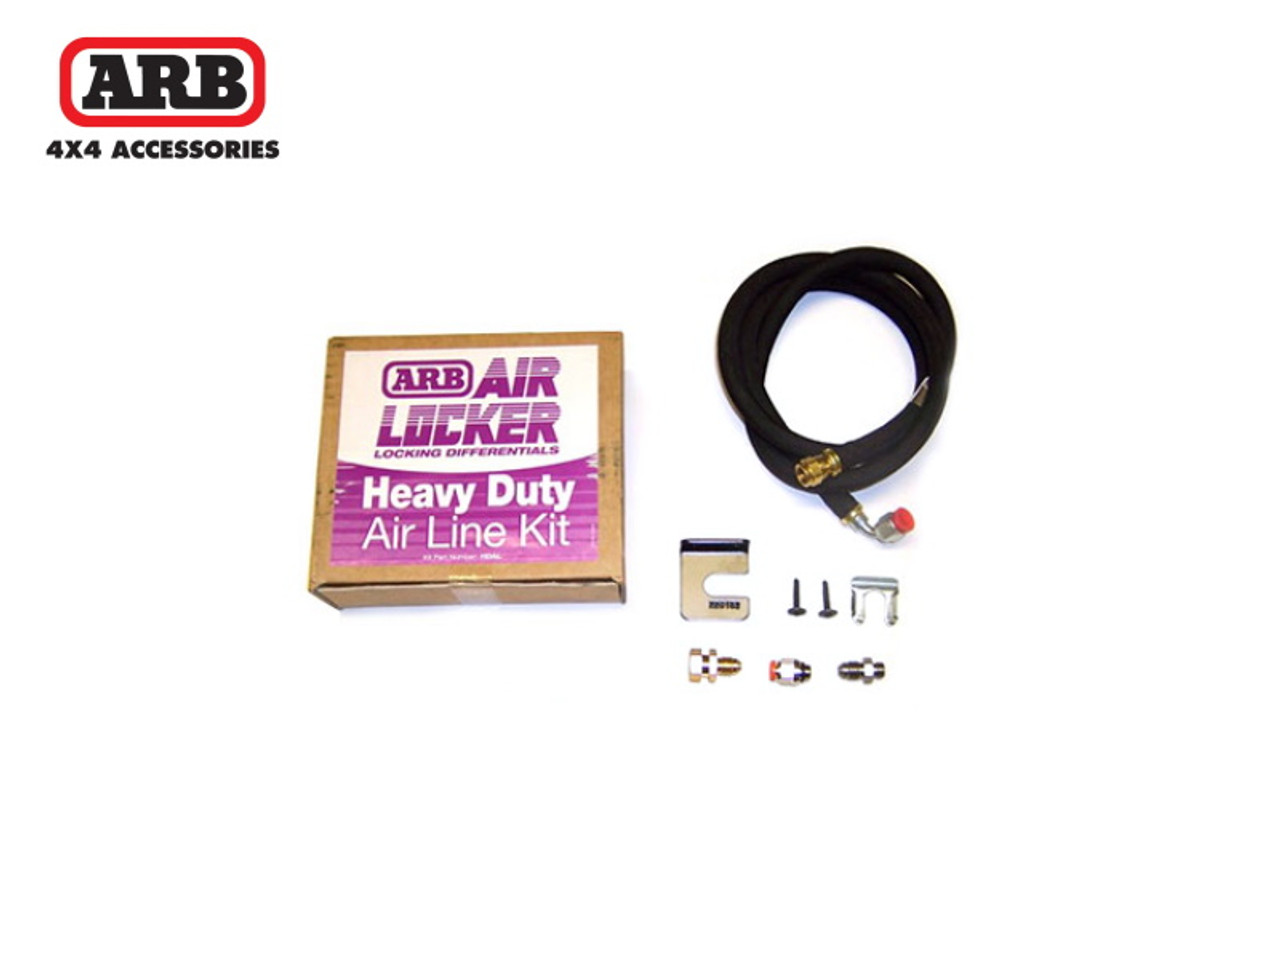 ARB HEAVY DUTY AIR LOCKER AIR LINE KIT OFF ROAD EXPEDITION DIFF LOCK